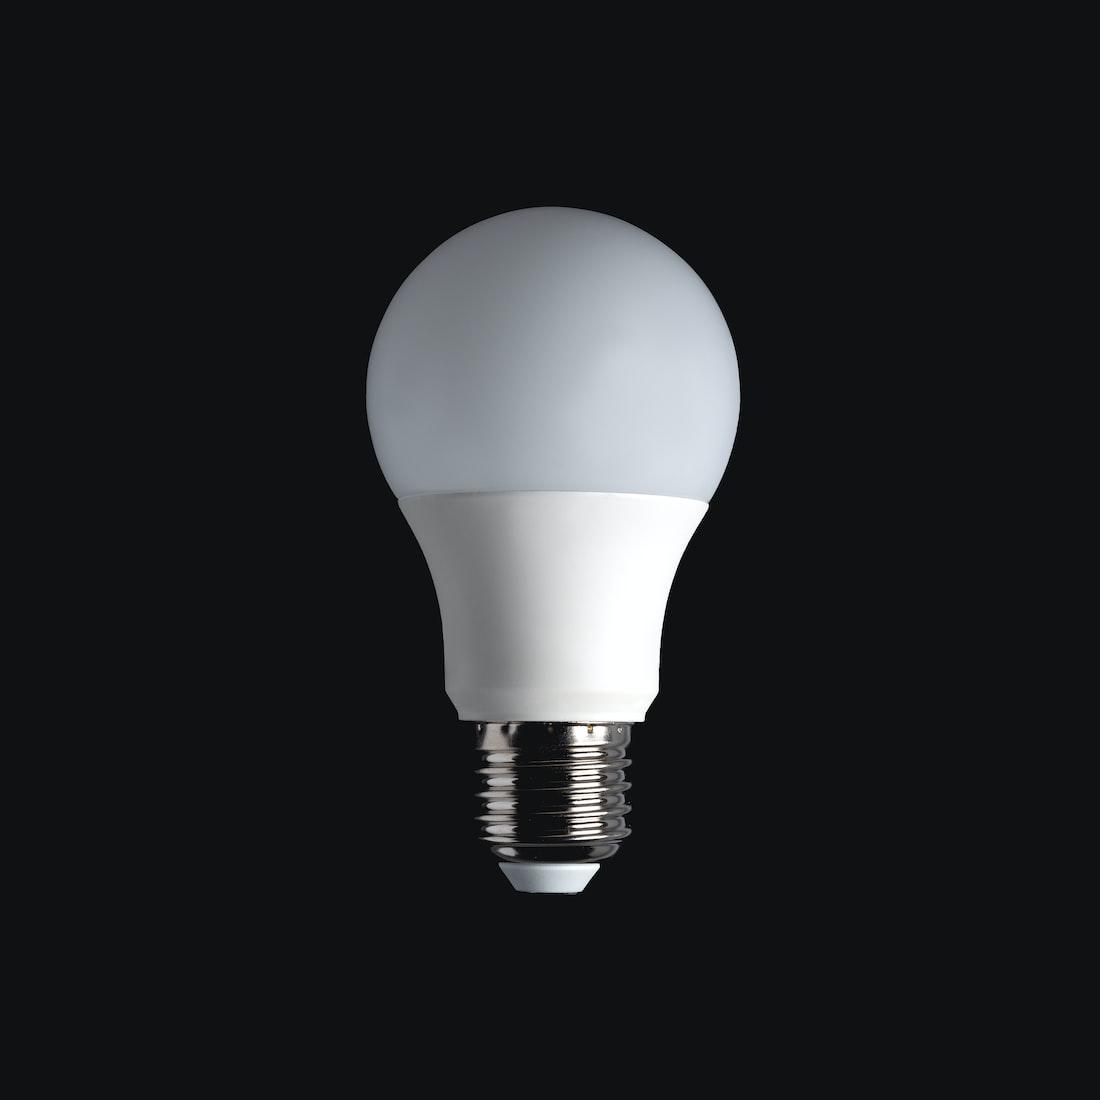 Will It Light Up?